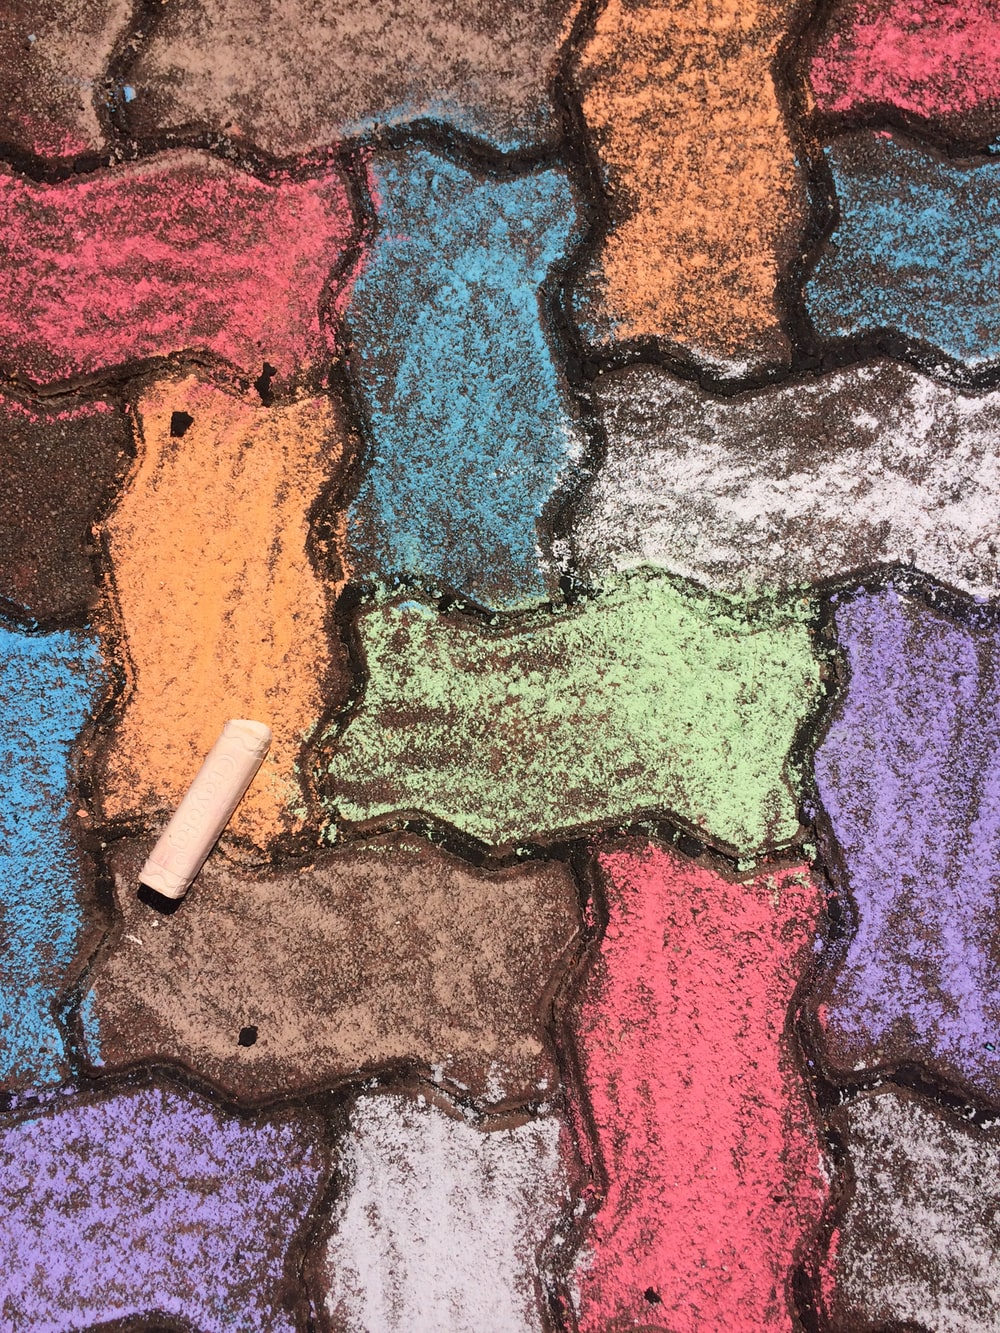 close-up photo of multicolored dumble brick pavement